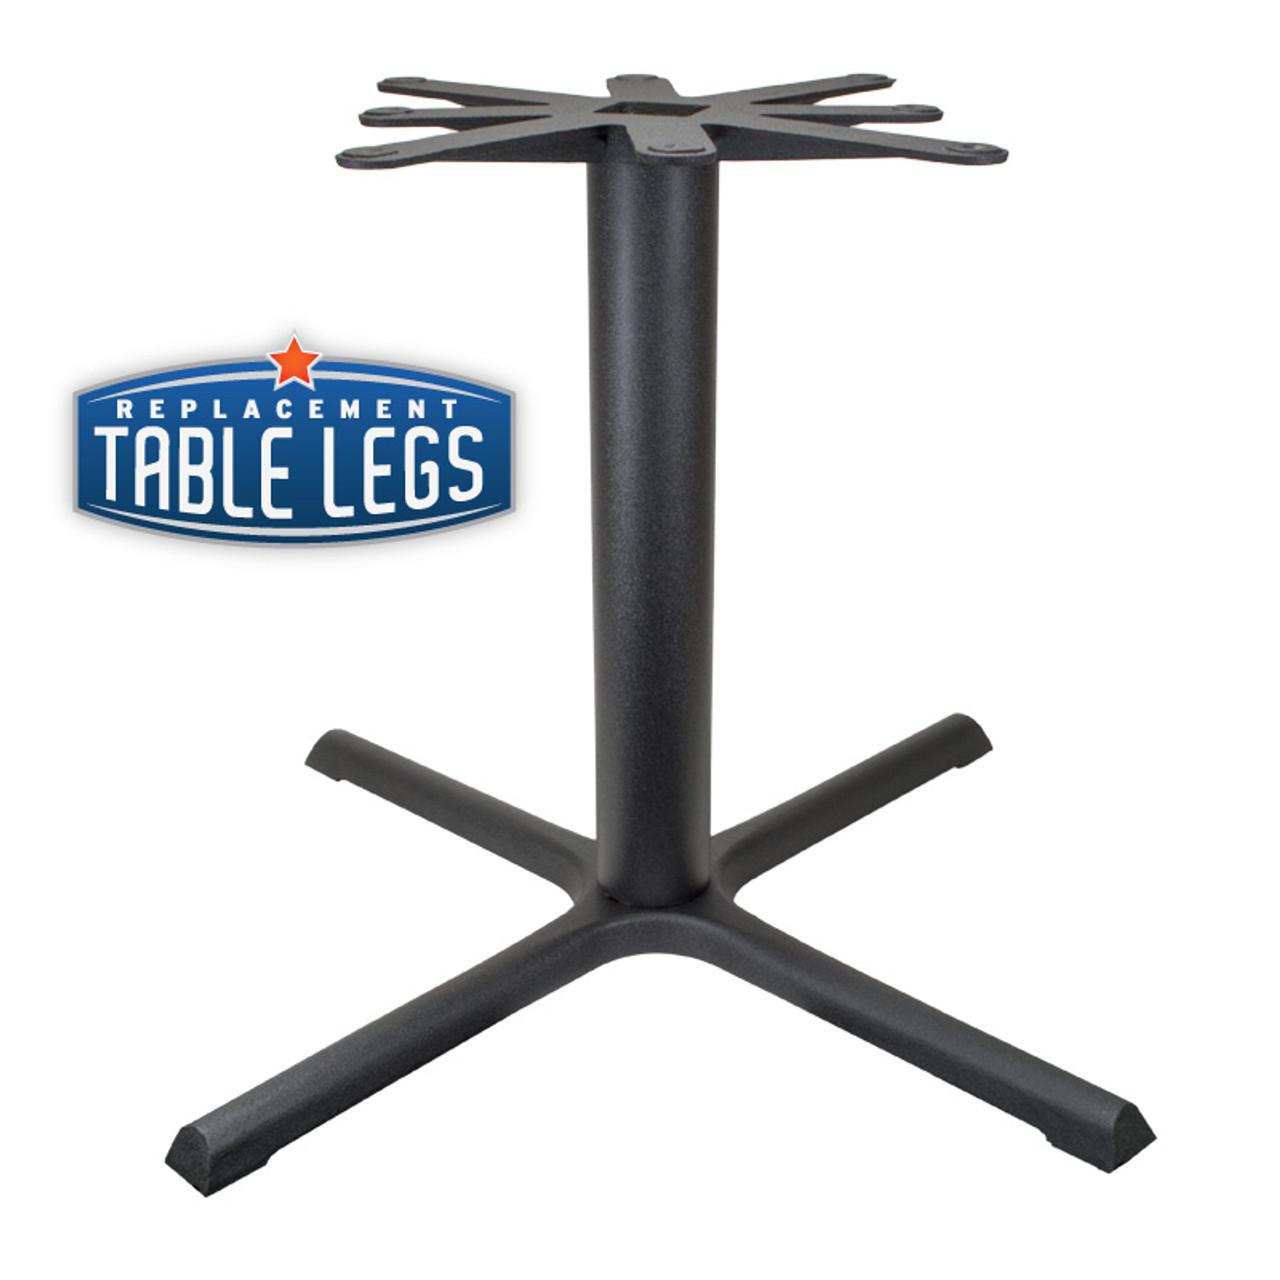 "CAST IRON TABLE BASE, X Style 40""x40"", 28-1/2"" height, 4"" diameter steel column - replacementtablelegs.com"